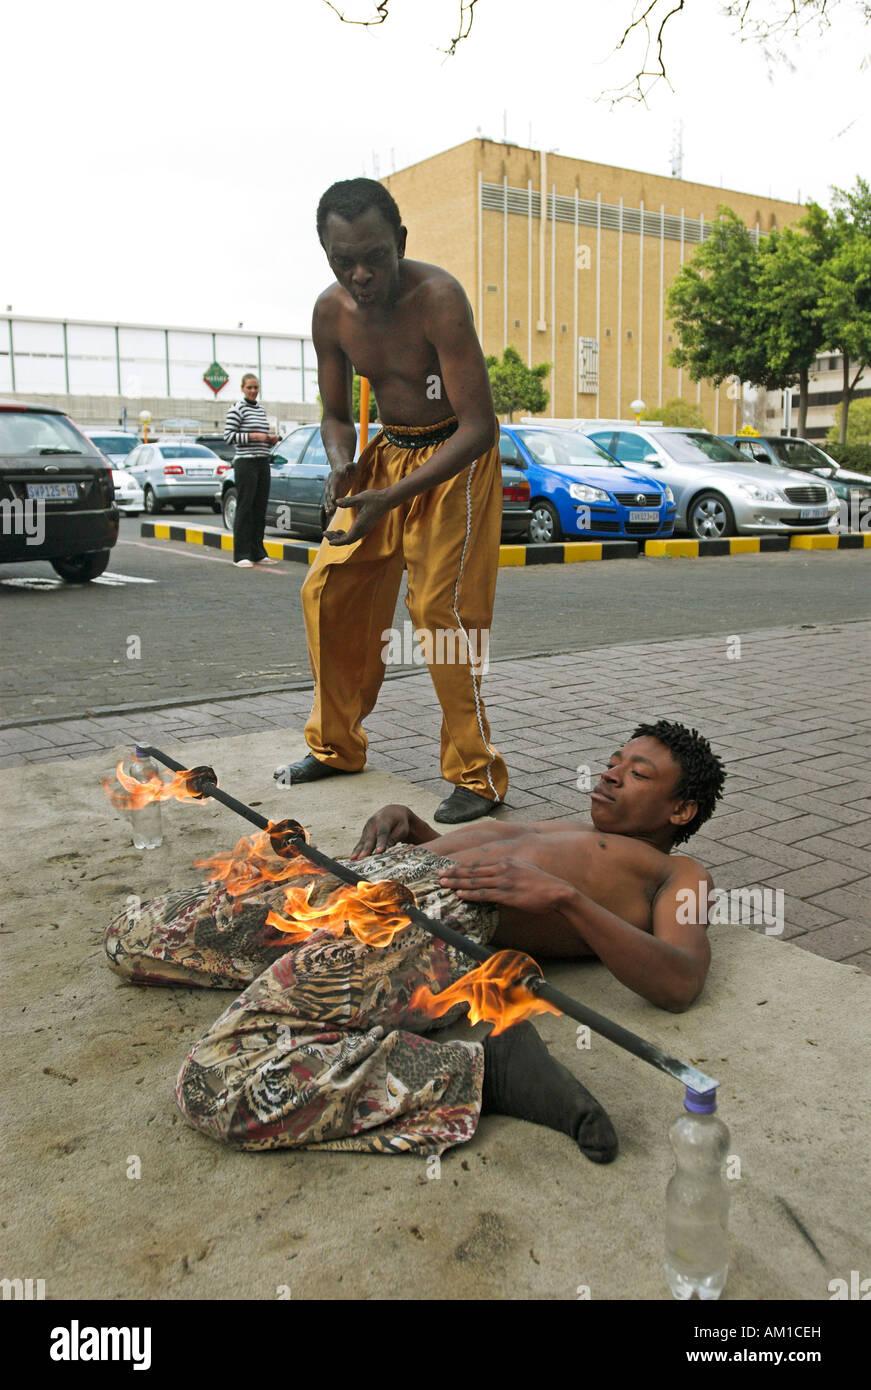 Street performer in Rosebank, Johannesburg, Suedafrika, Afrika - Stock Image